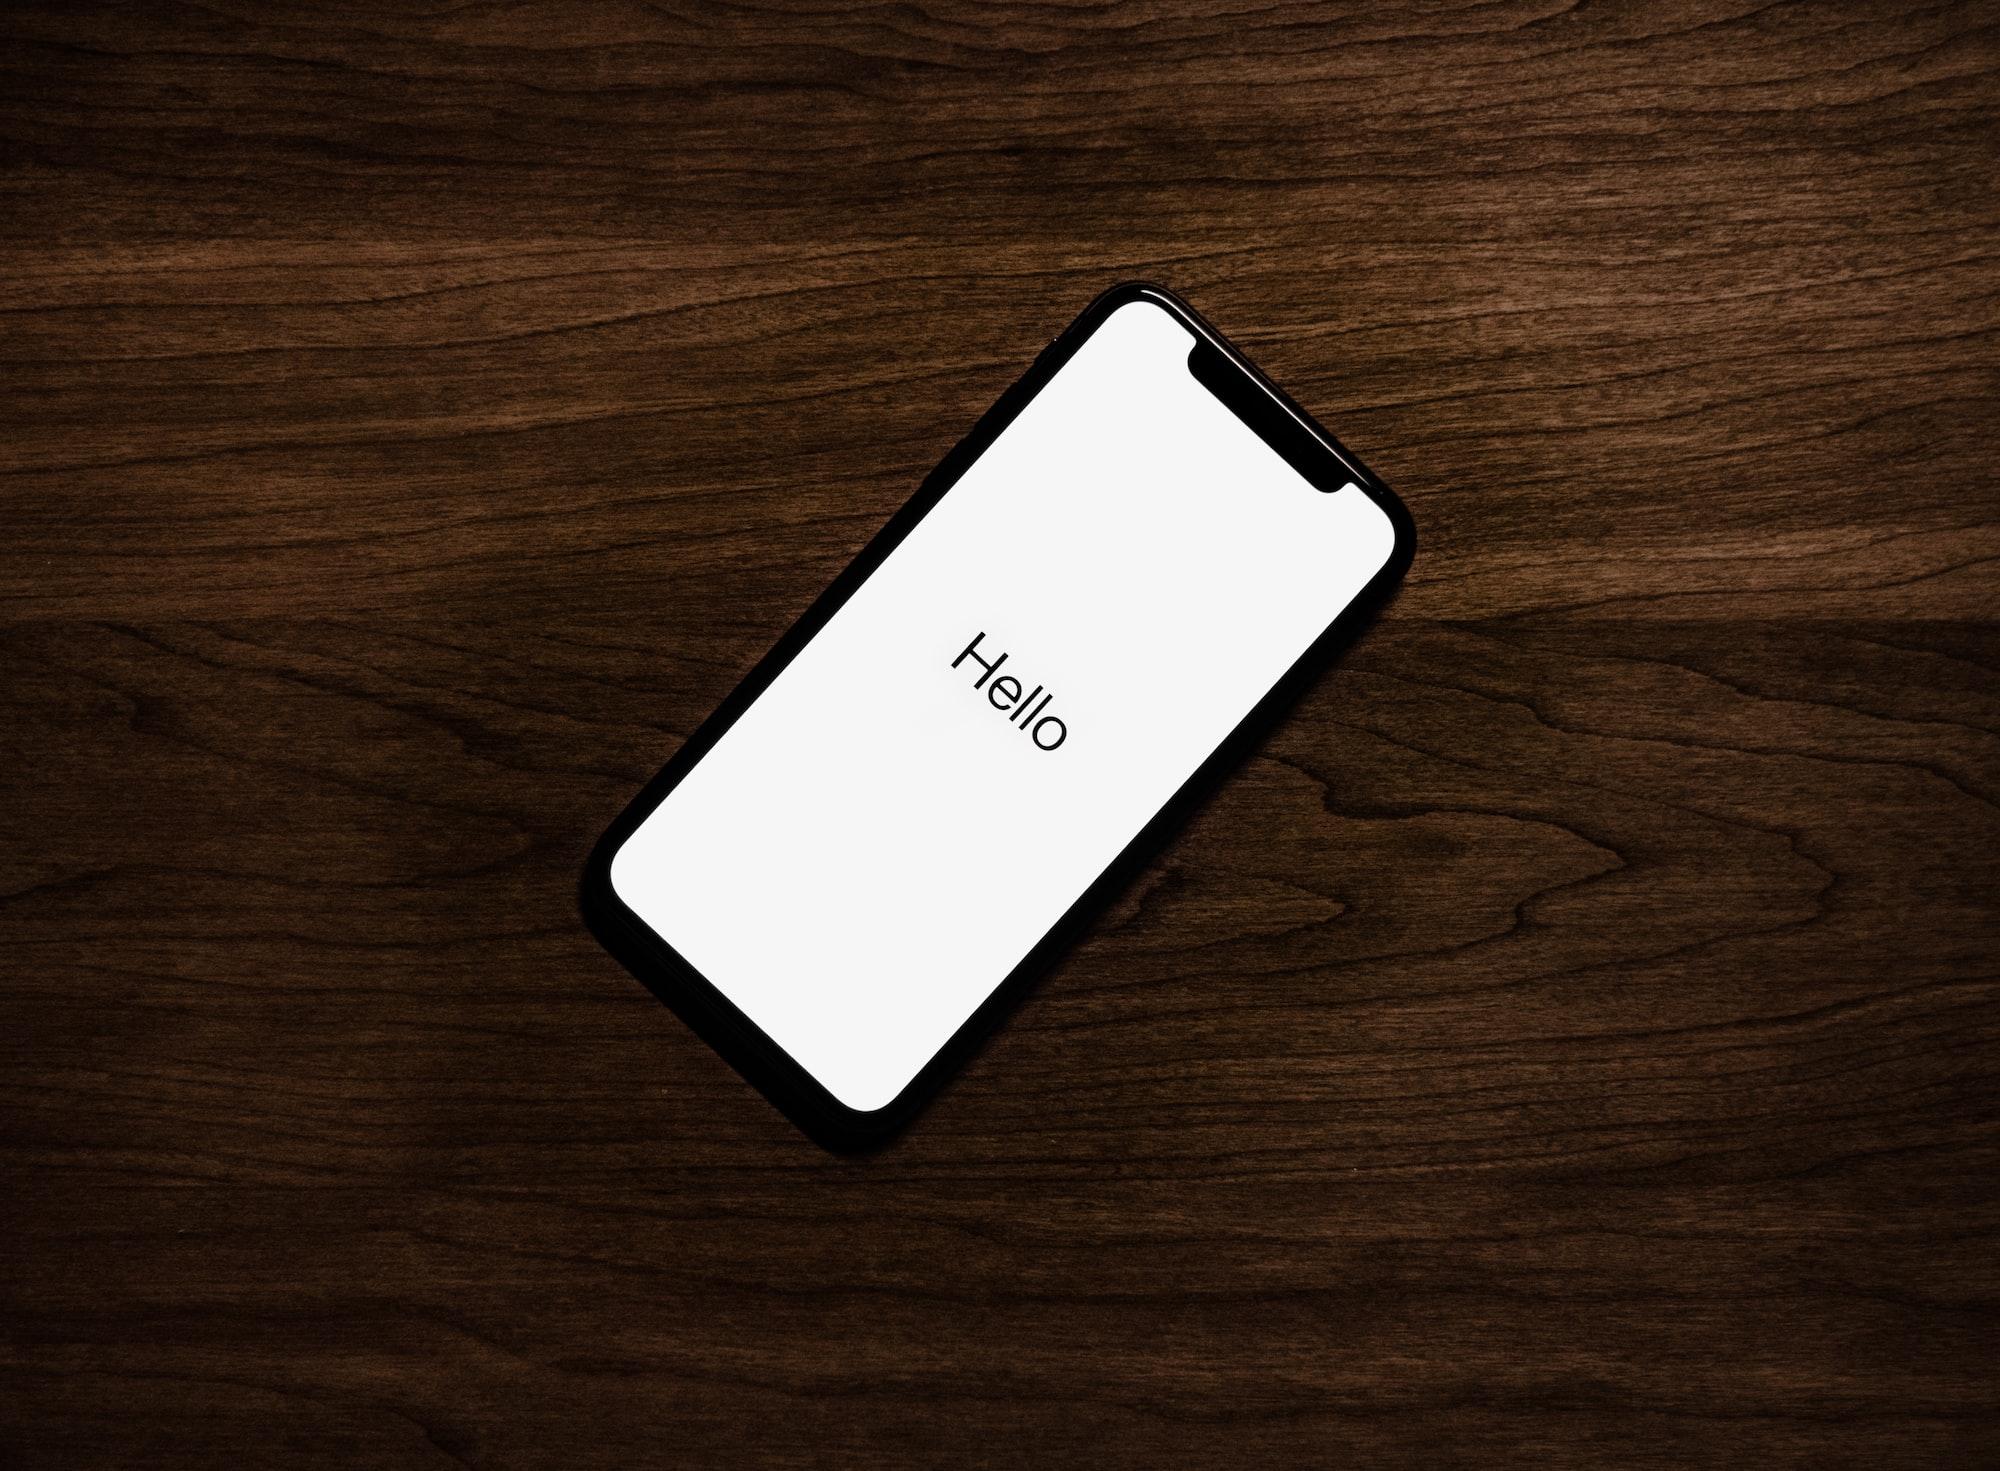 iPhone X com problemas de touch?